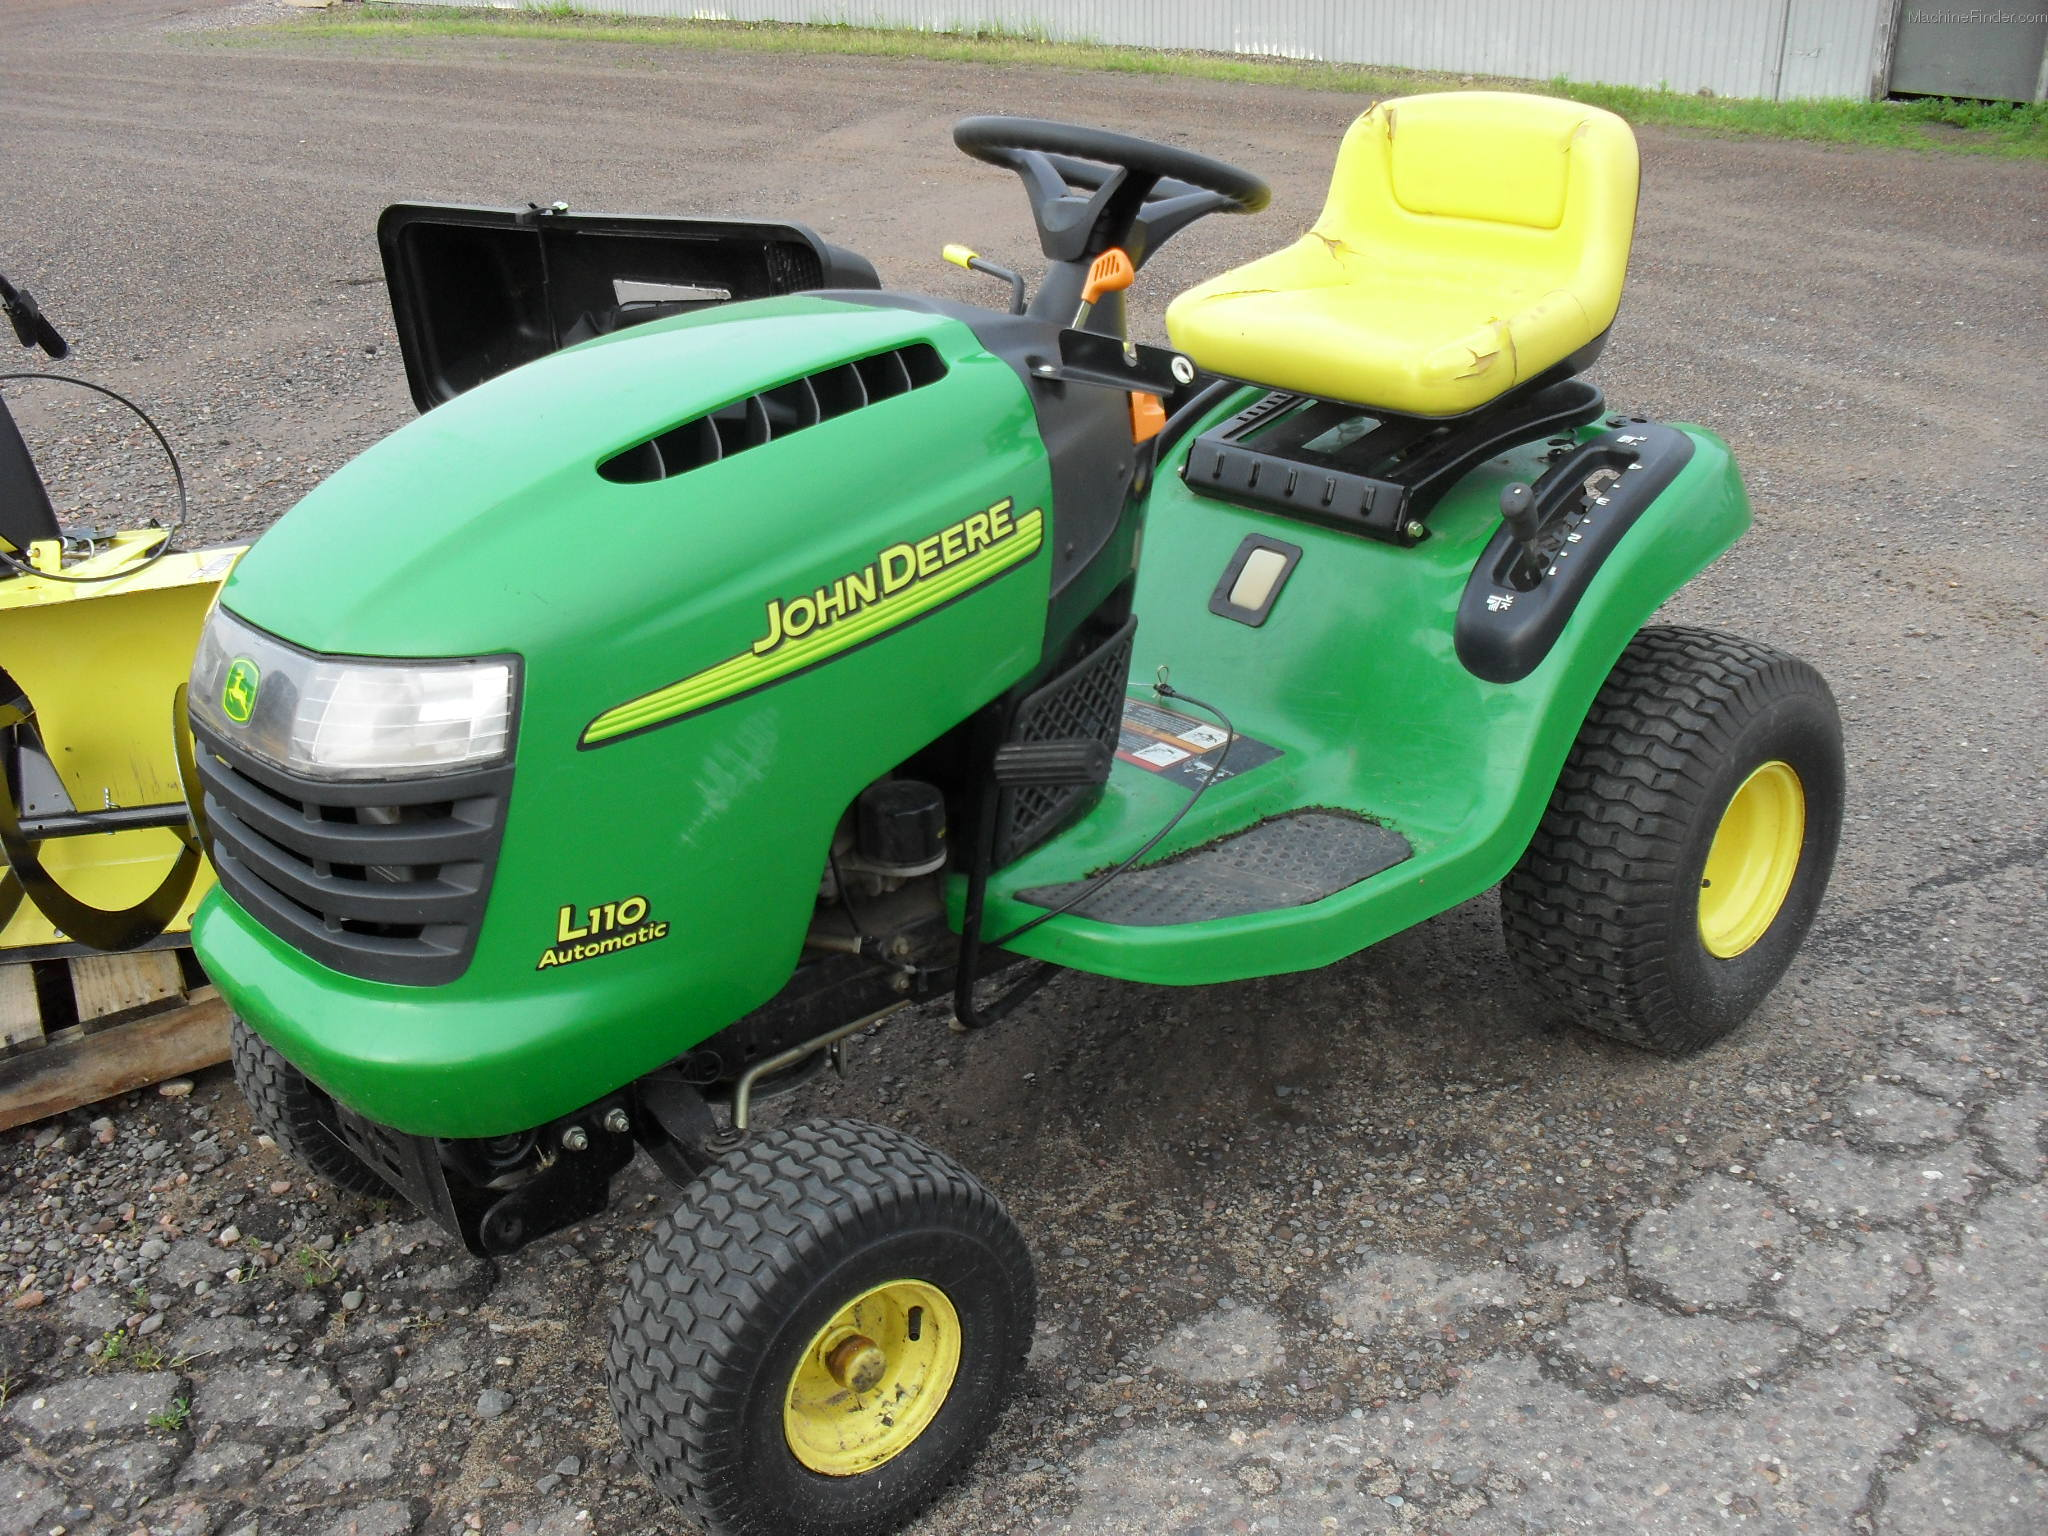 John Deere L110 Mower Parts | John Deere Parts: John Deere